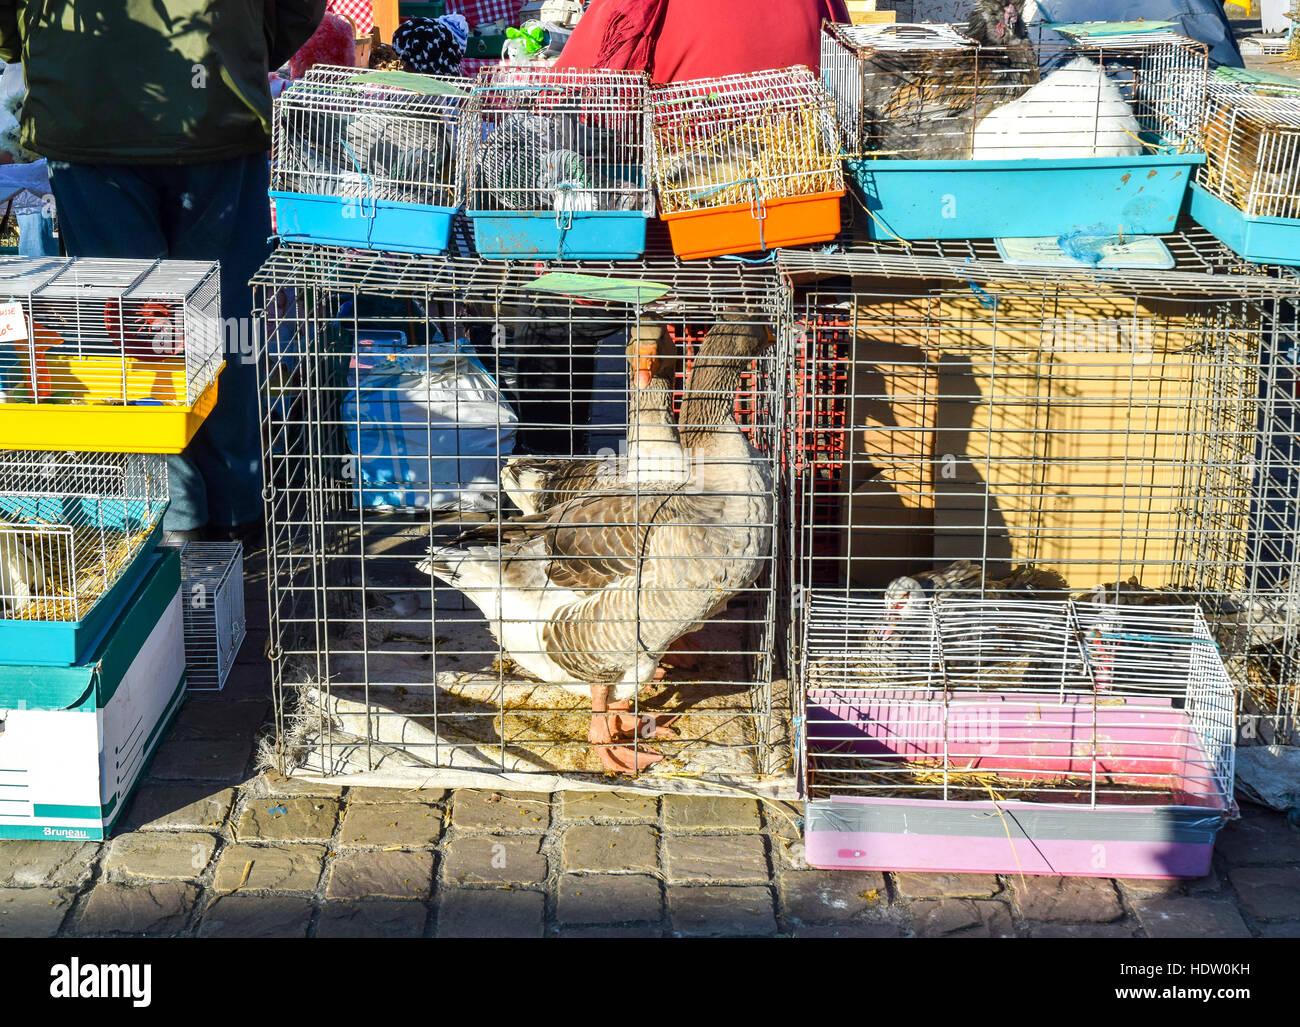 duck cage stockfotos duck cage bilder alamy. Black Bedroom Furniture Sets. Home Design Ideas